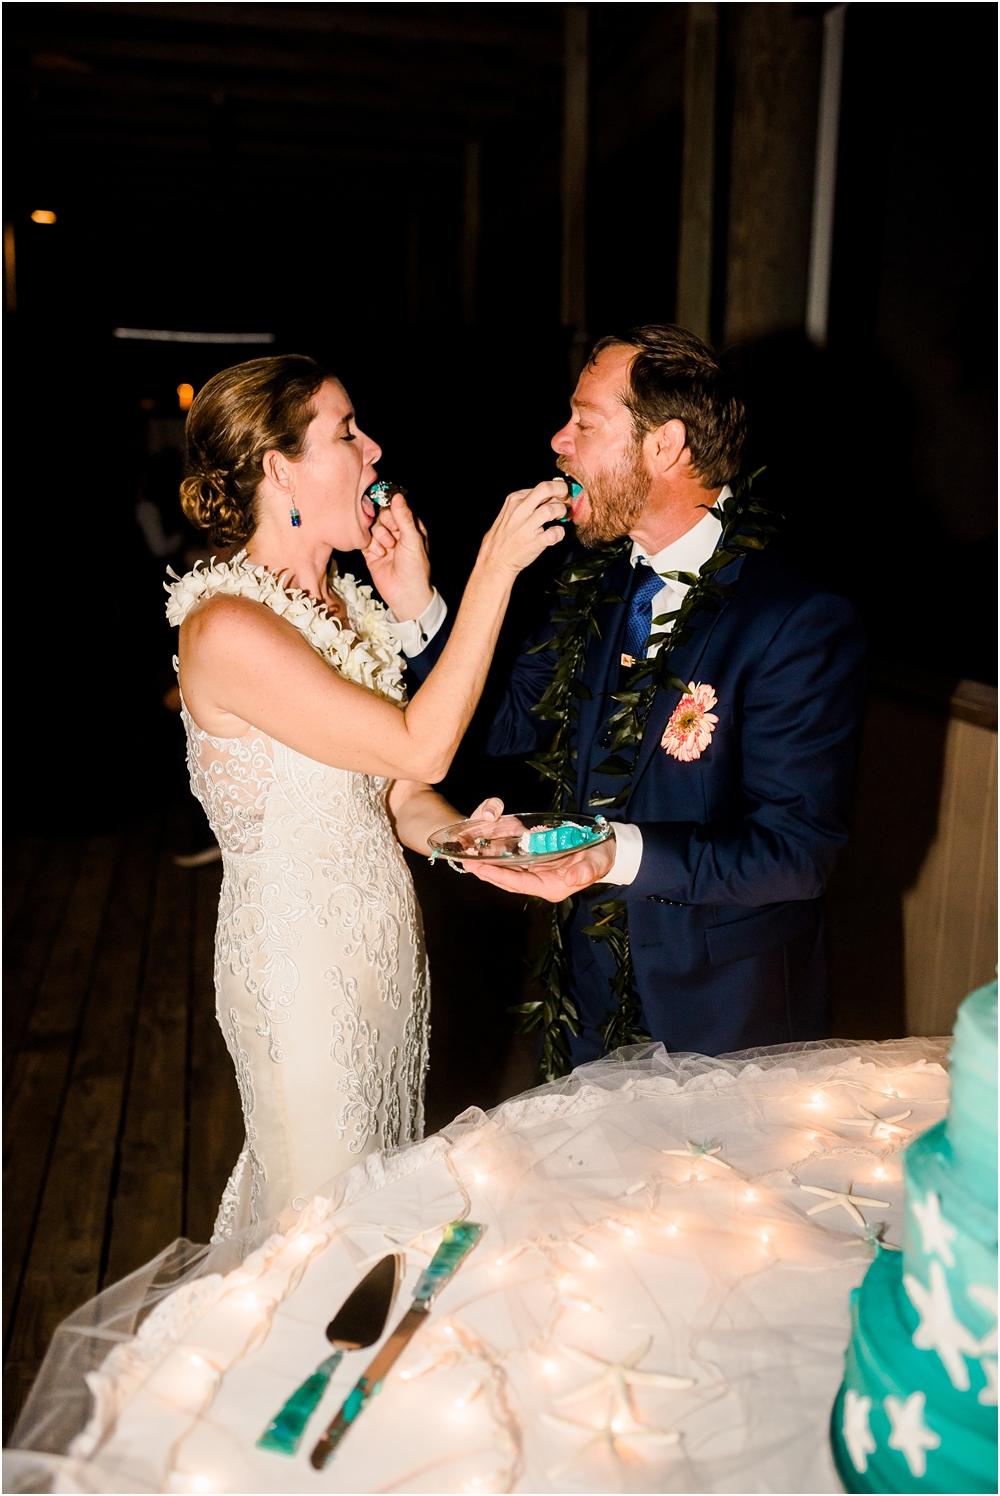 ledman-wedding-kiersten-stevenson-photography-30a-panama-city-beach-dothan-tallahassee-(639-of-763).JPG